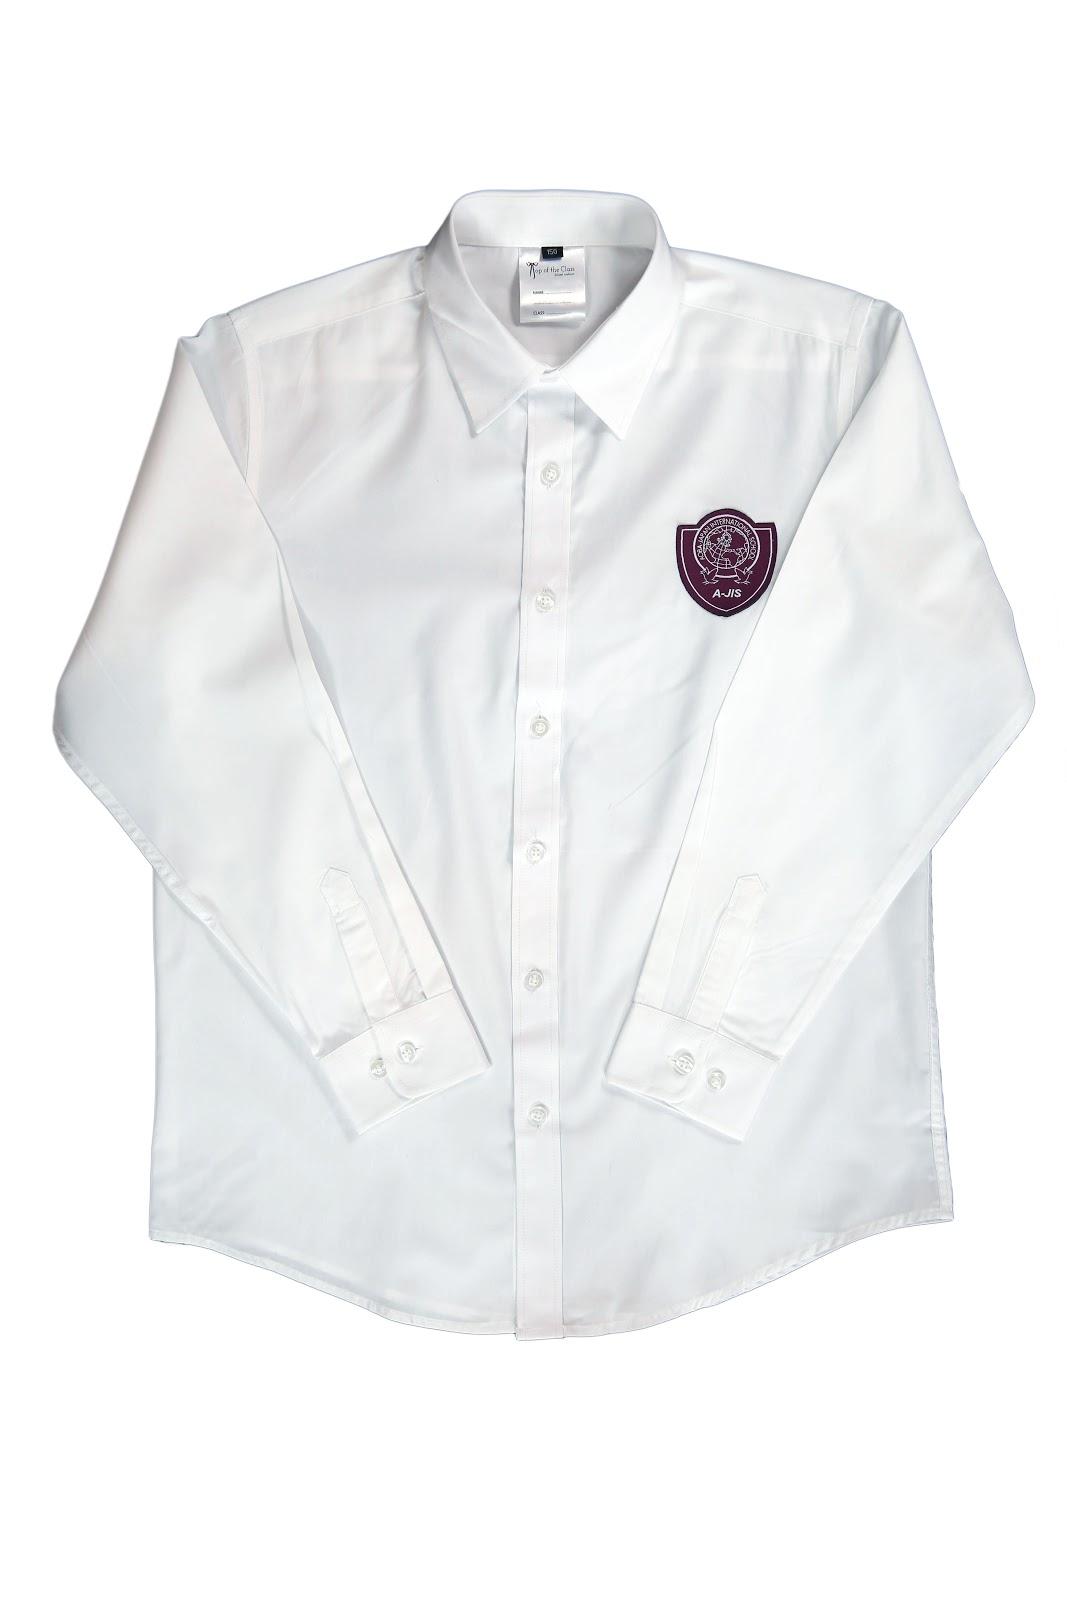 School Uniform  (AJIS Girls White Long Sleeve Shirt).jpg